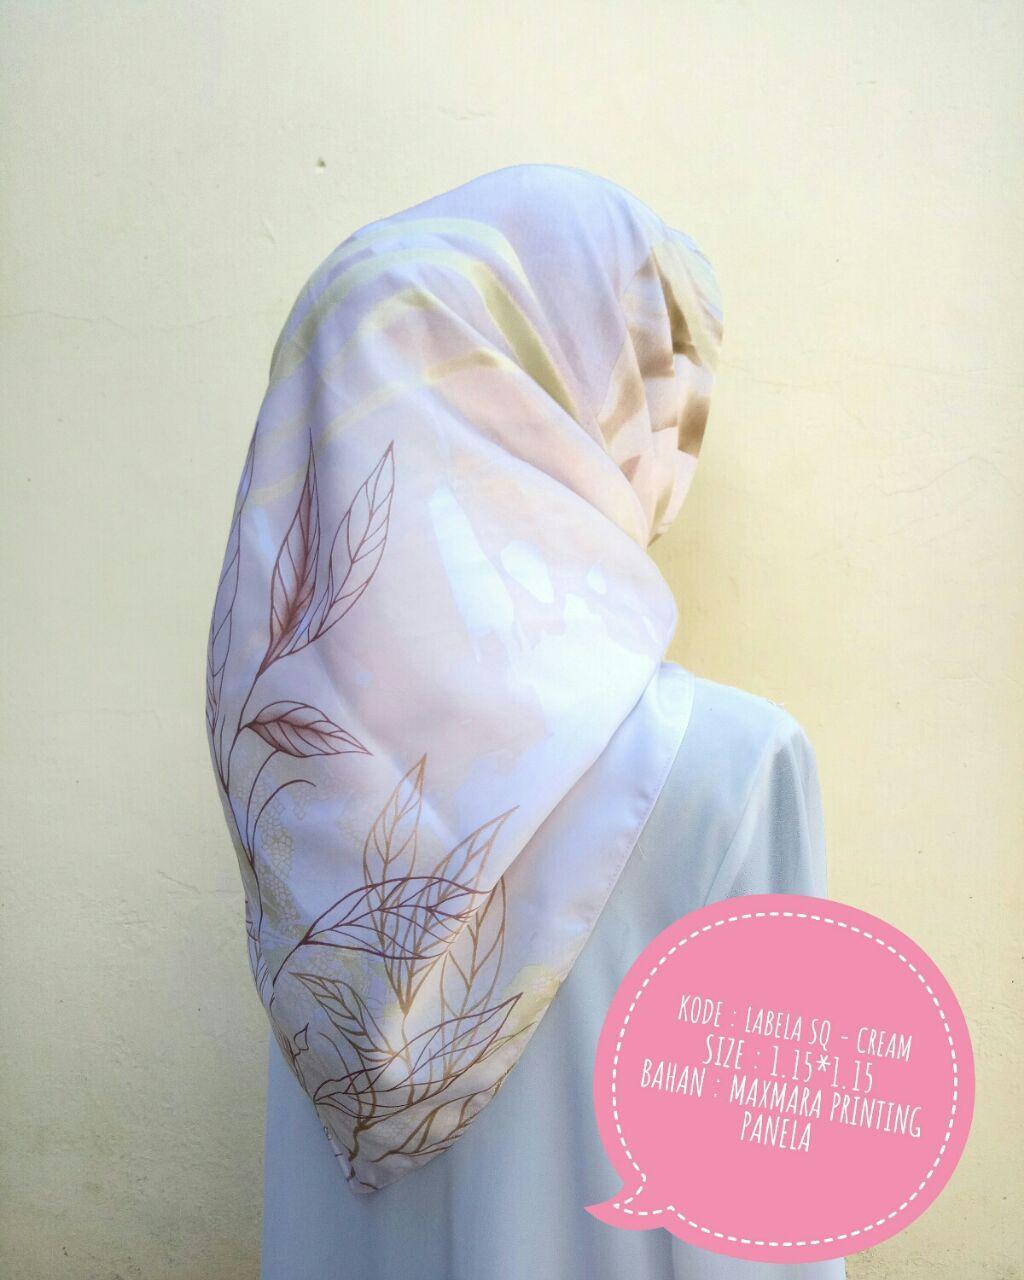 Labela SQ Jilbab Segi Empat Kerudung Segi Tiga Panel Motif Maxmara Printing Exclusive dan Limited Bunga by Nggemesin Hijab